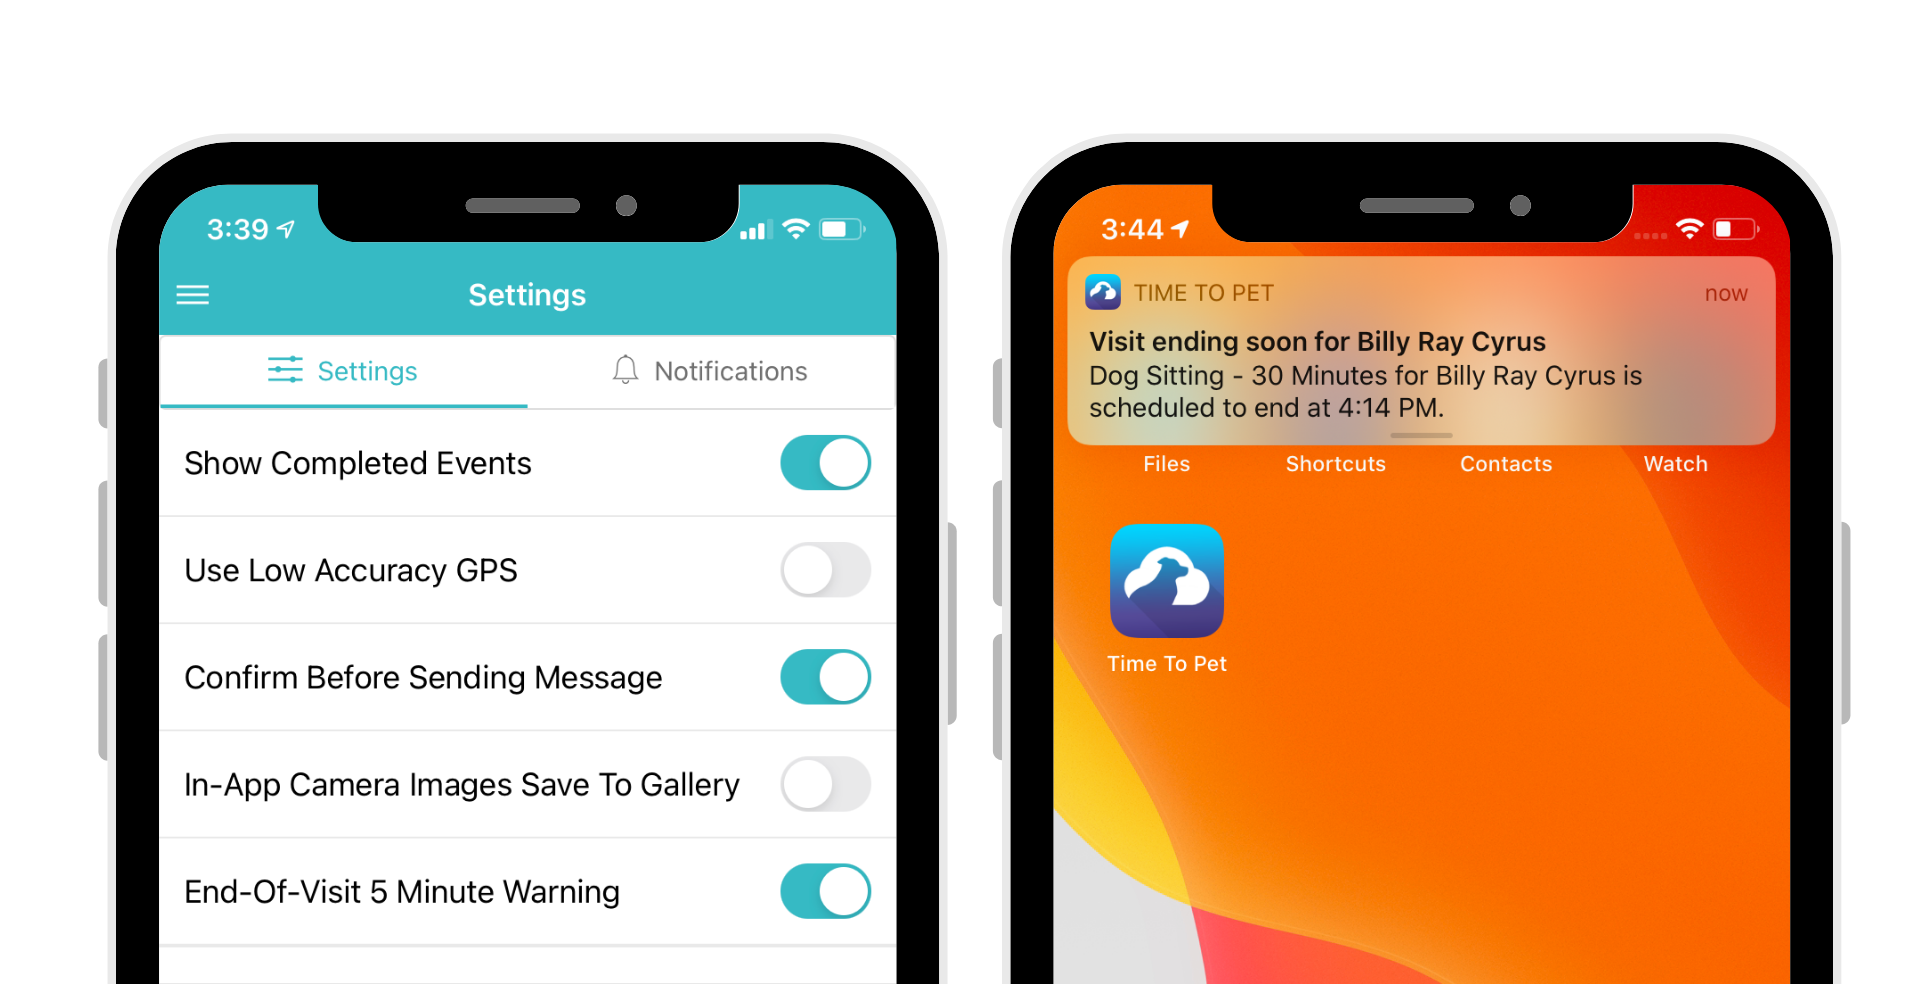 app-5-minute-warning-summary.png